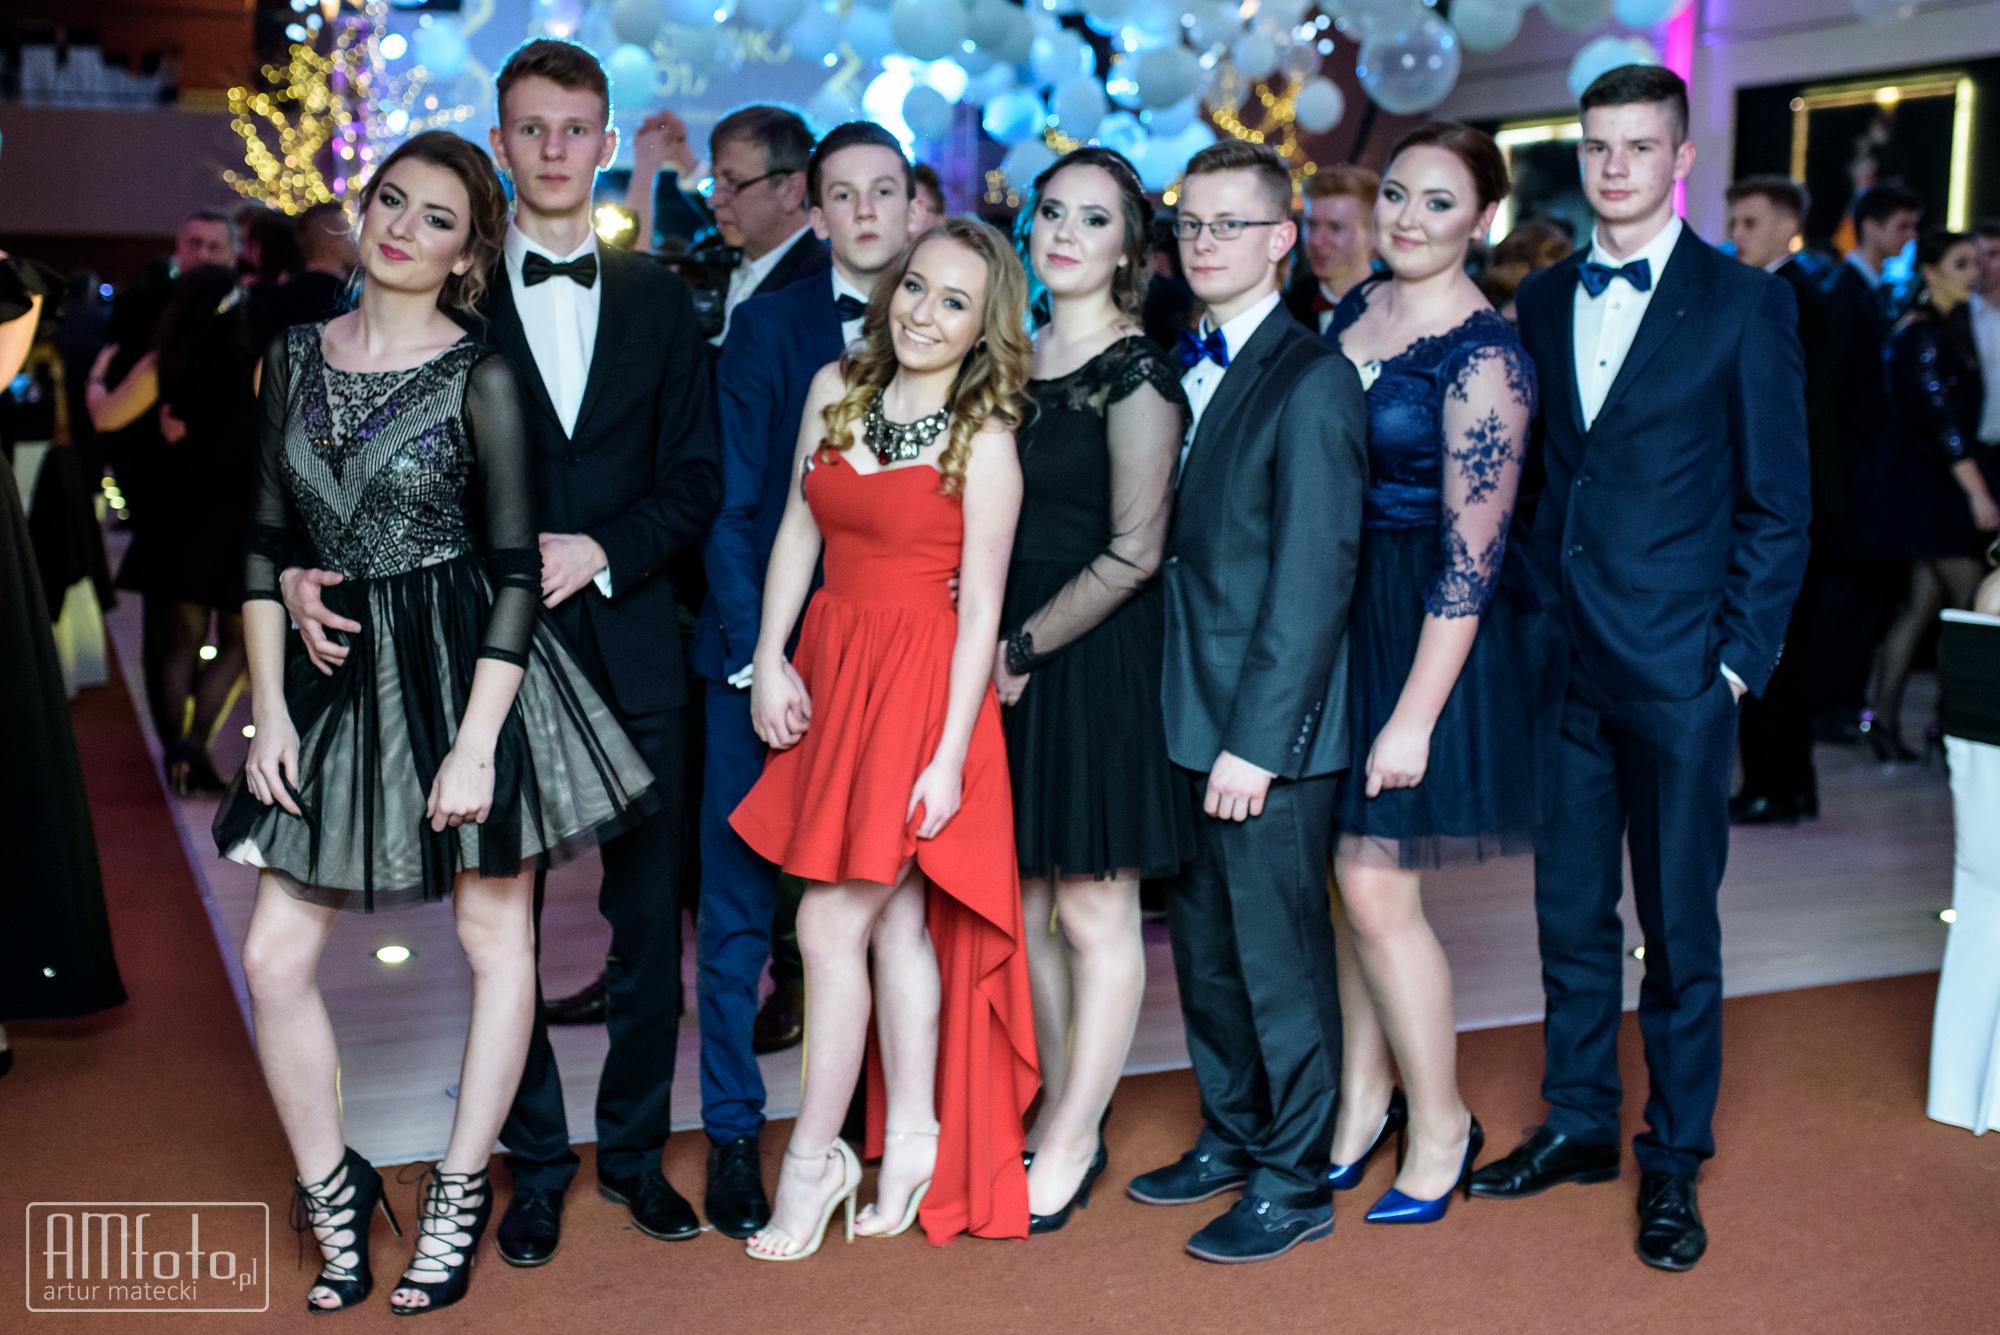 studniowka_2017_3LO_Kalisz_reportaz__www_amfoto_pl-0795.jpg